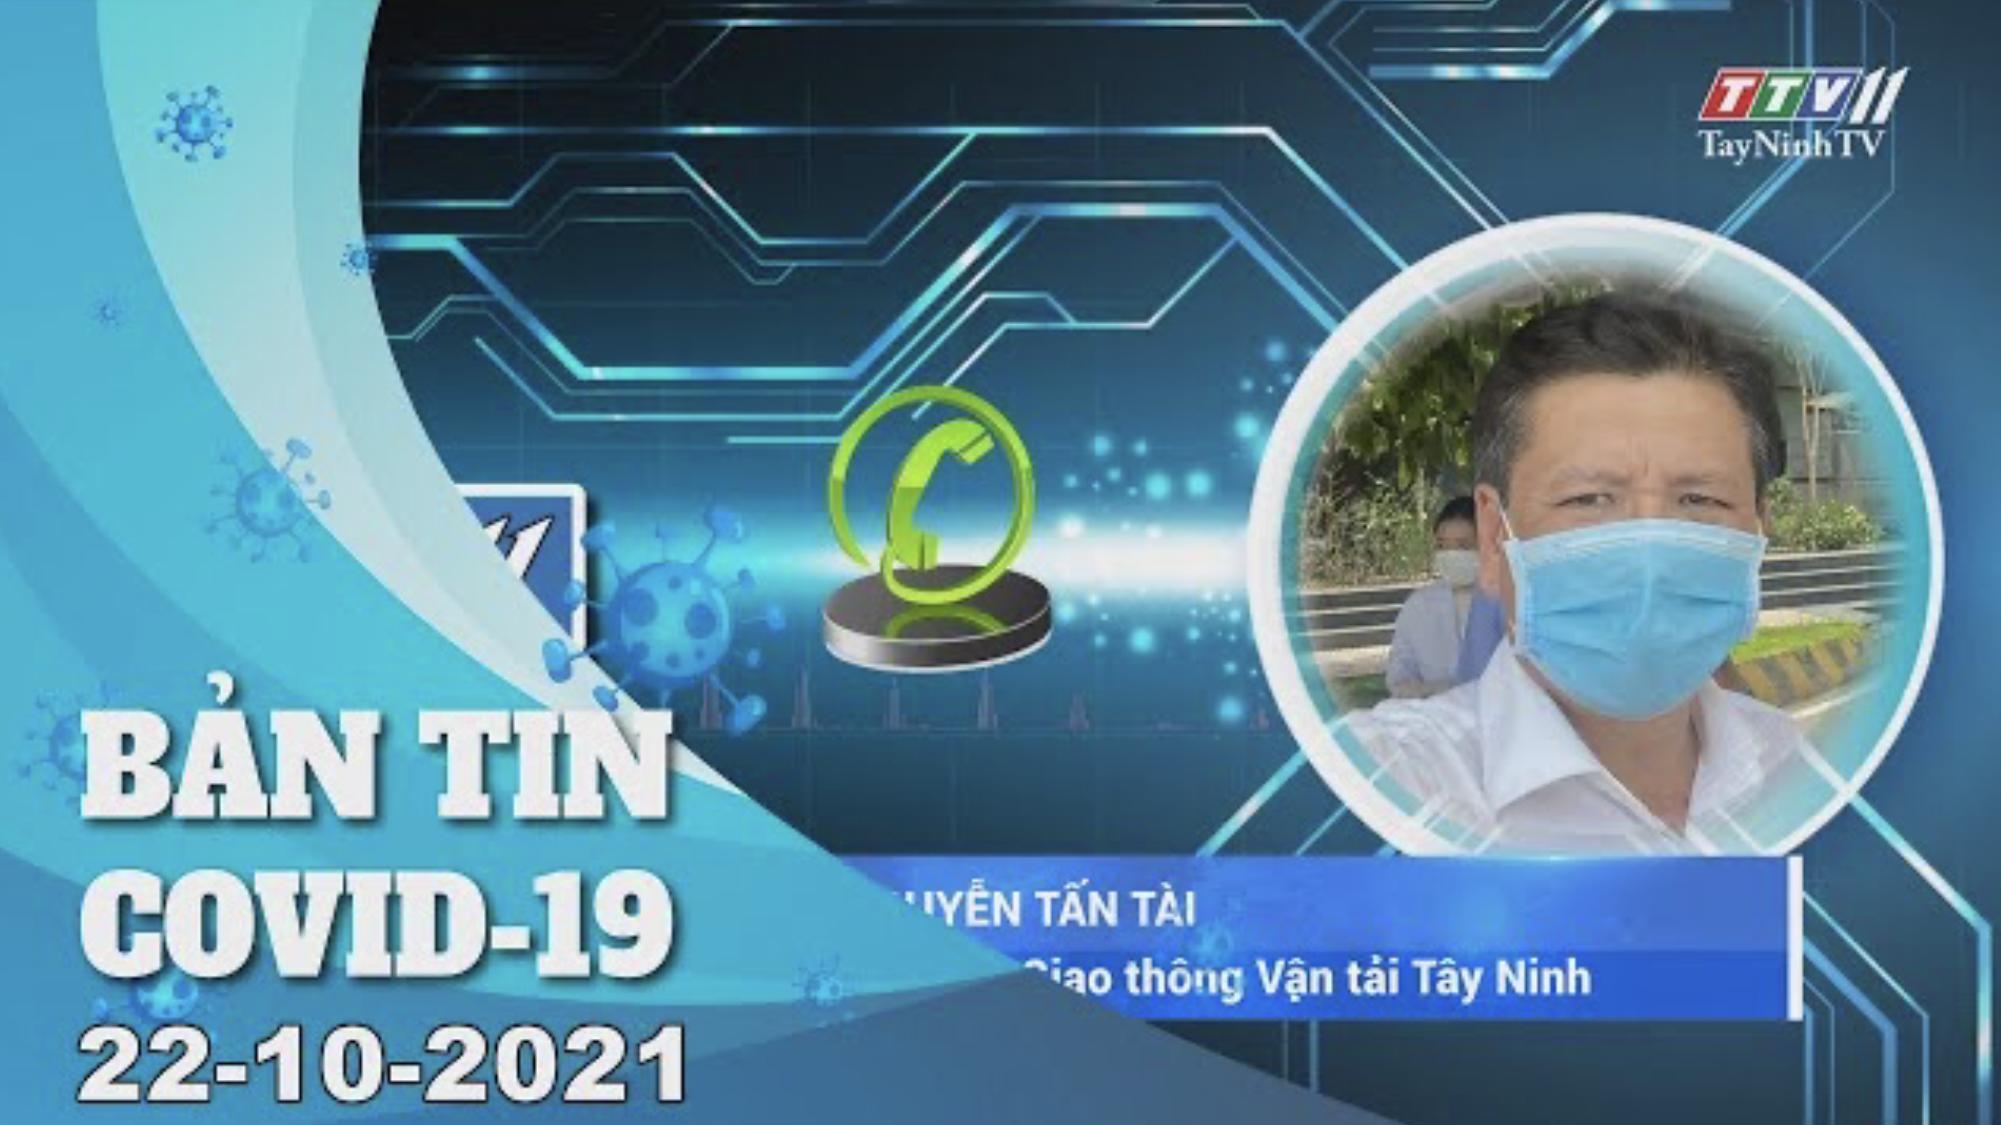 BẢN TIN COVID-19 22/10/2021 | Tin tức hôm nay | TayNinhTV